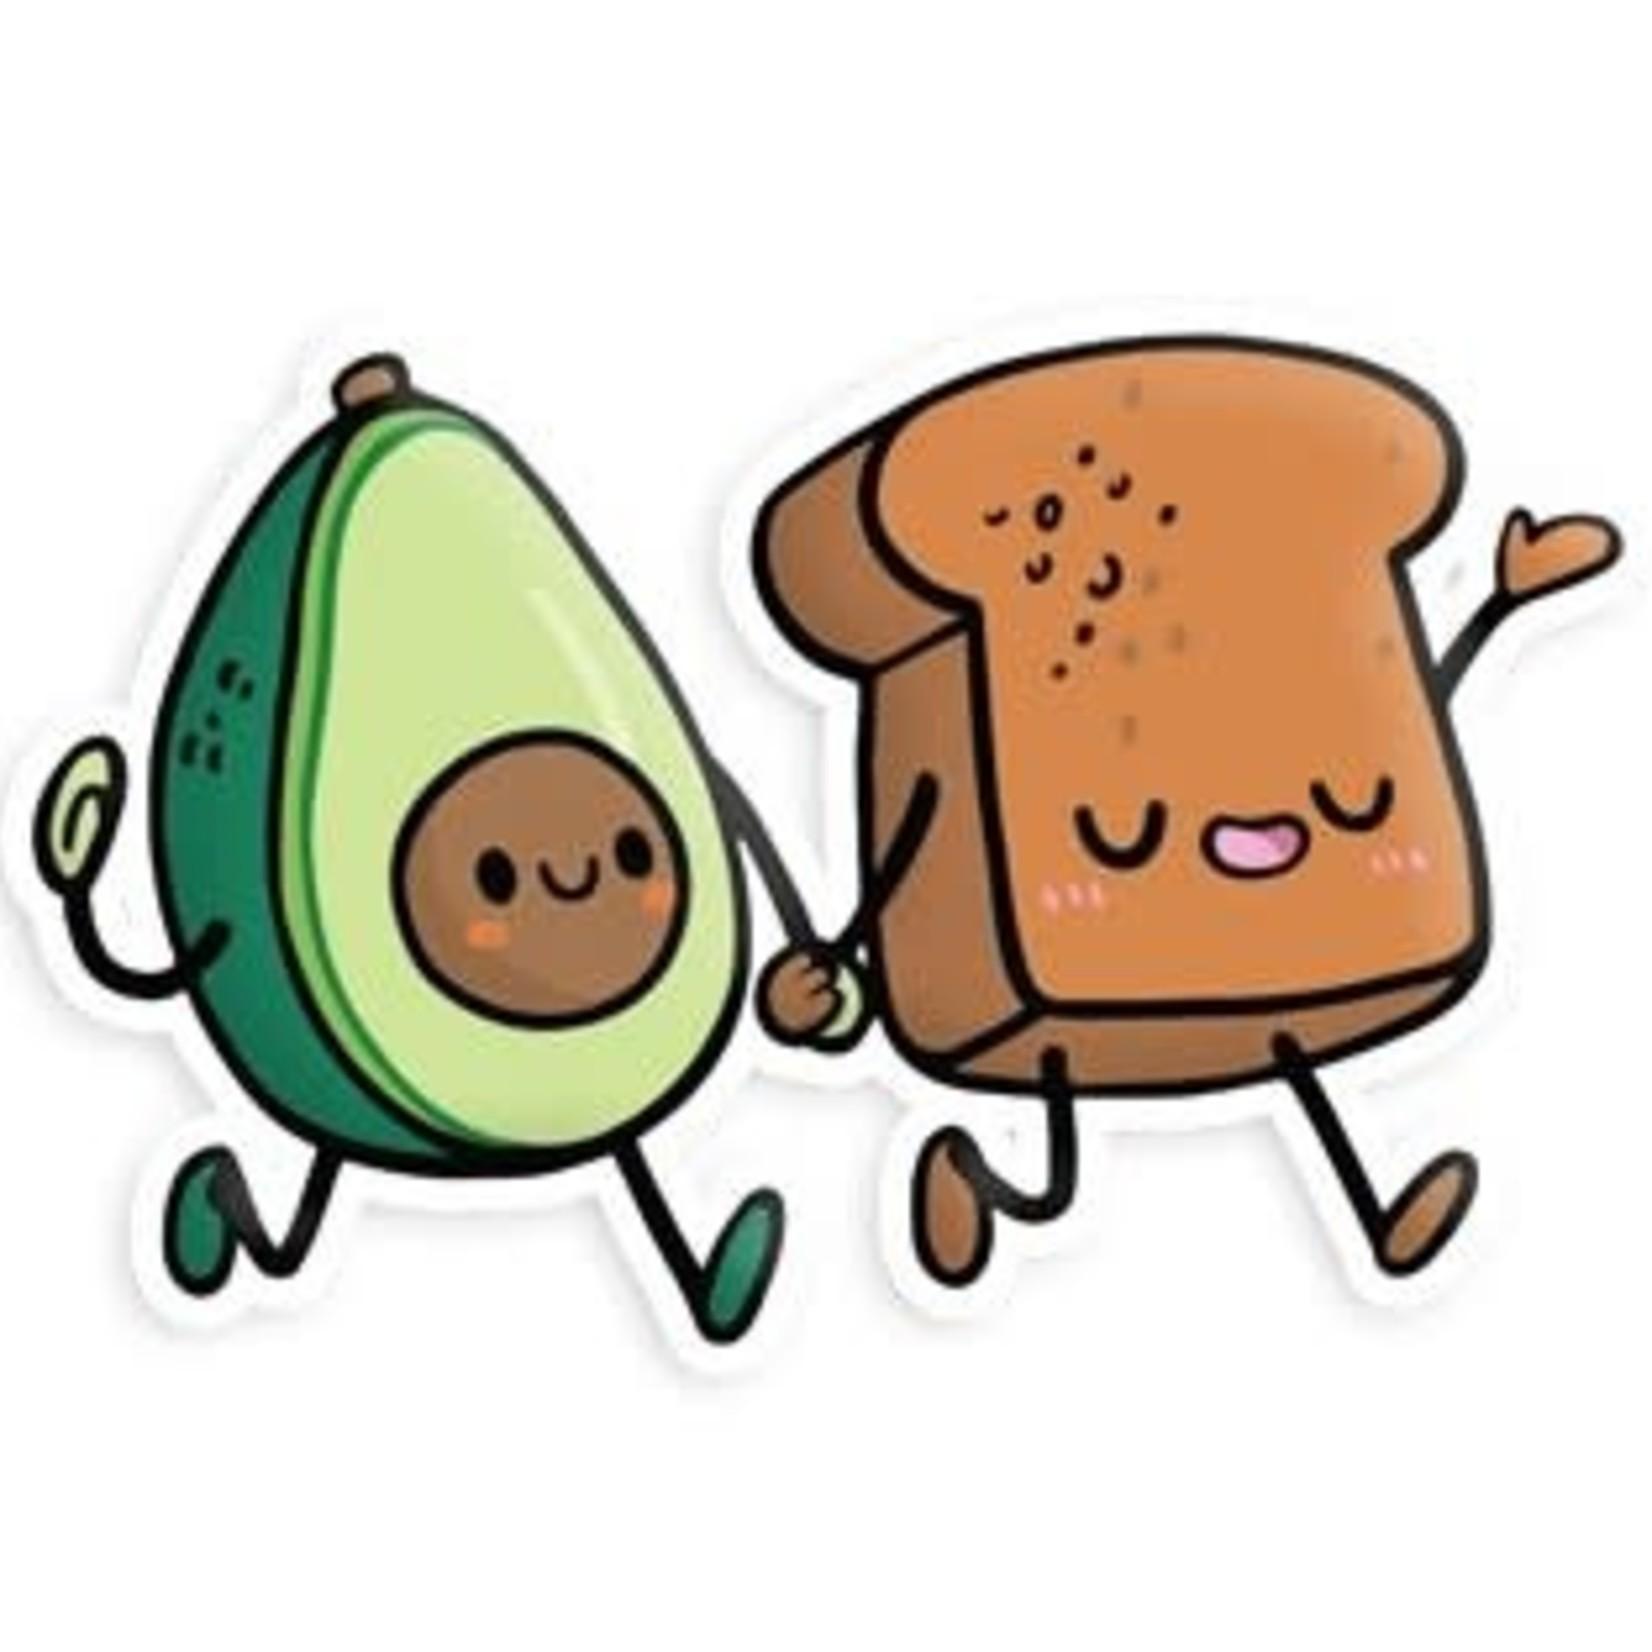 Squishable Avocado & Toast BFF Sticker